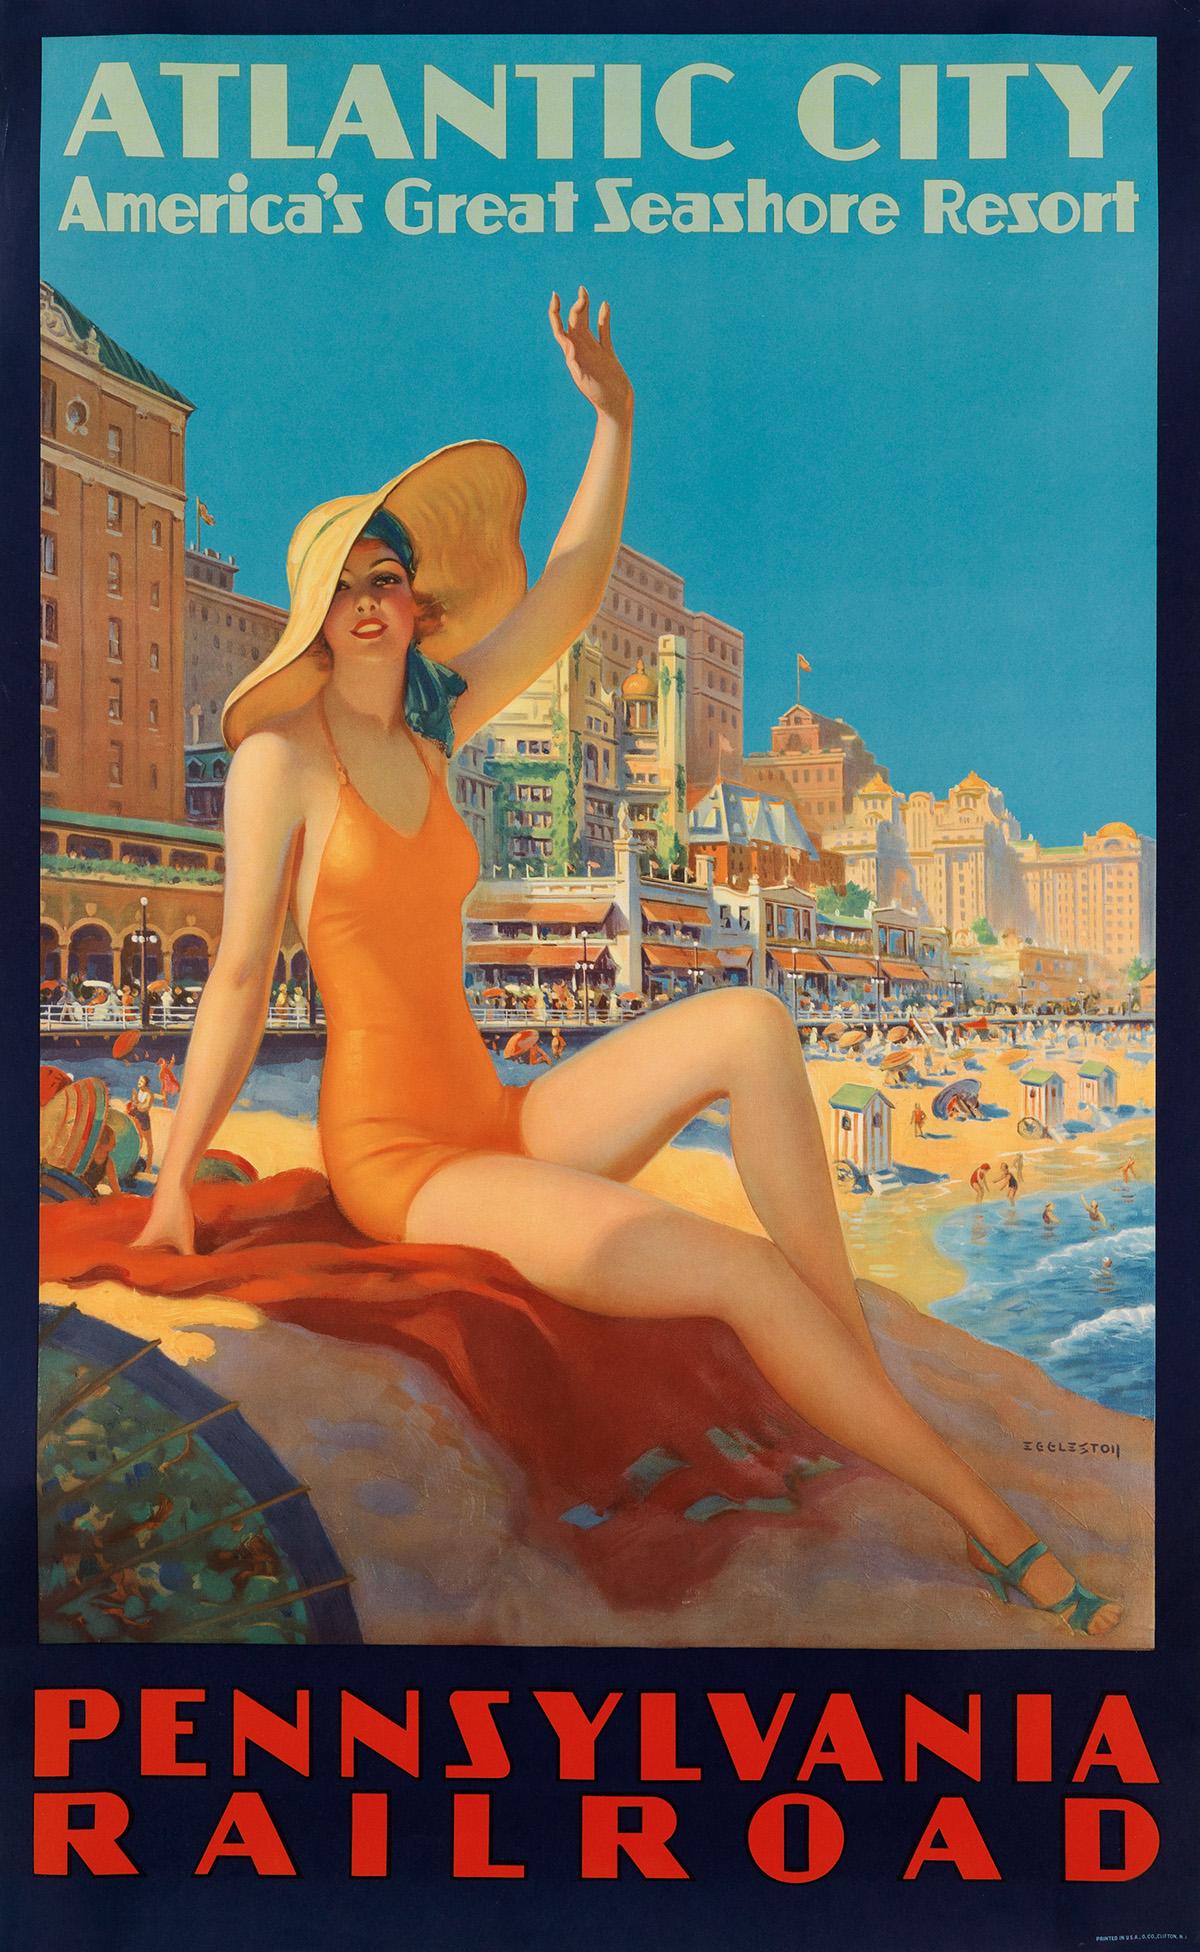 EDWARD-M-EGGLESTON-(1882-1941)-ATLANTIC-CITY--PENNSYLVANIA-R